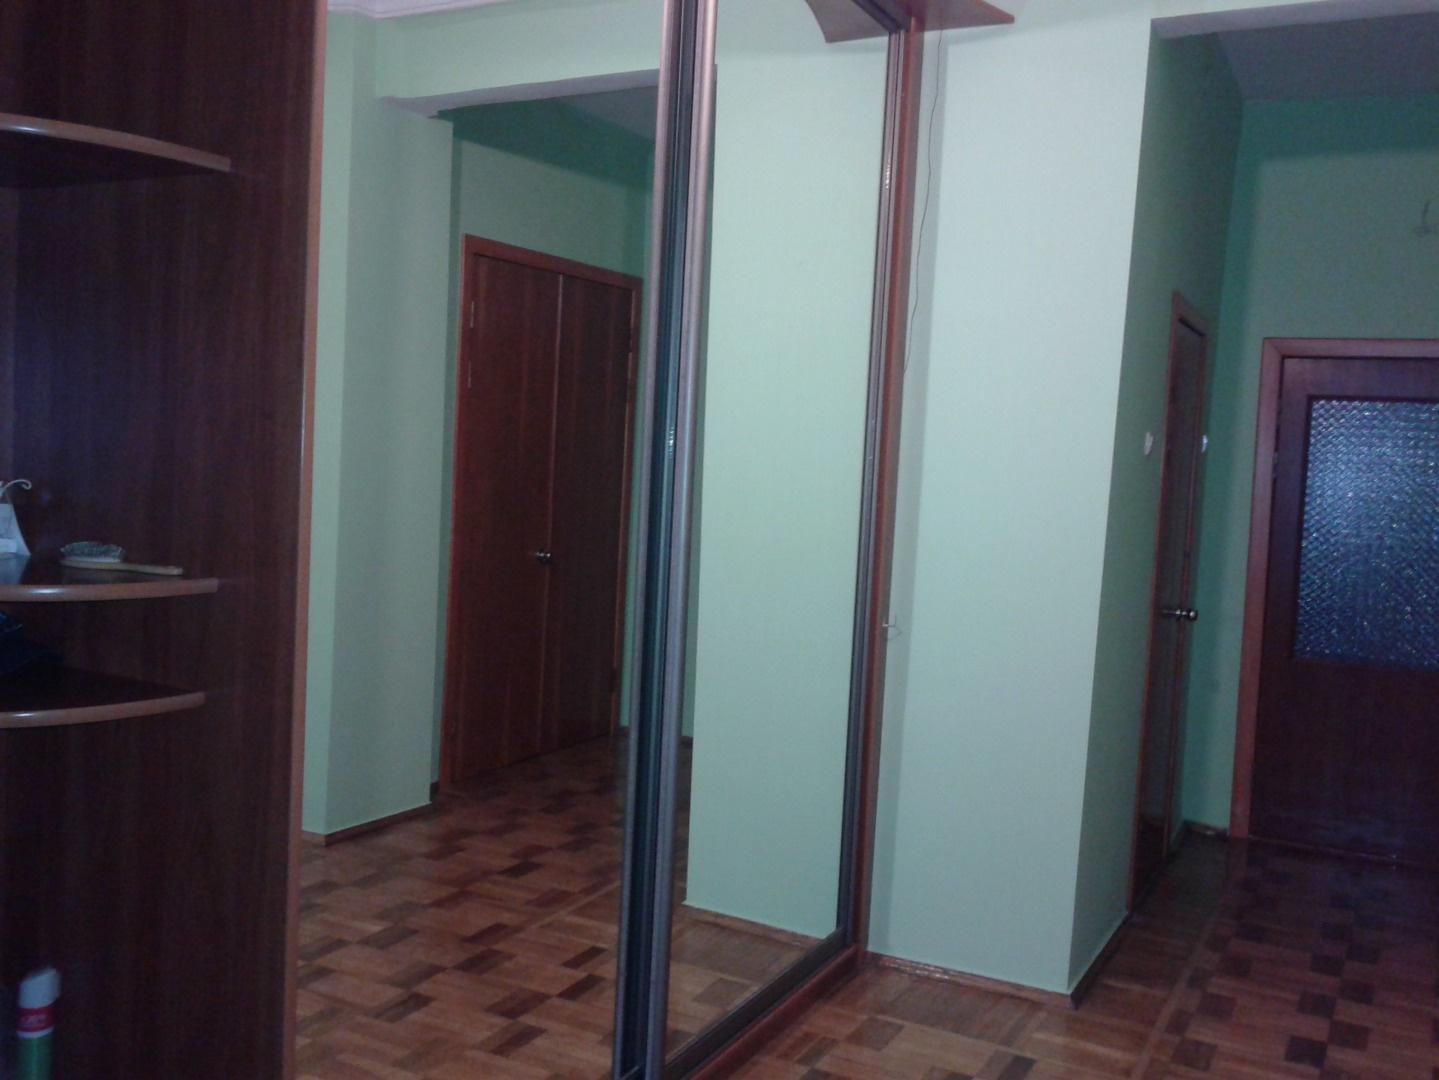 Продается 2-комнатная Квартира на ул. Шевченко Пр. — 90 000 у.е. (фото №6)